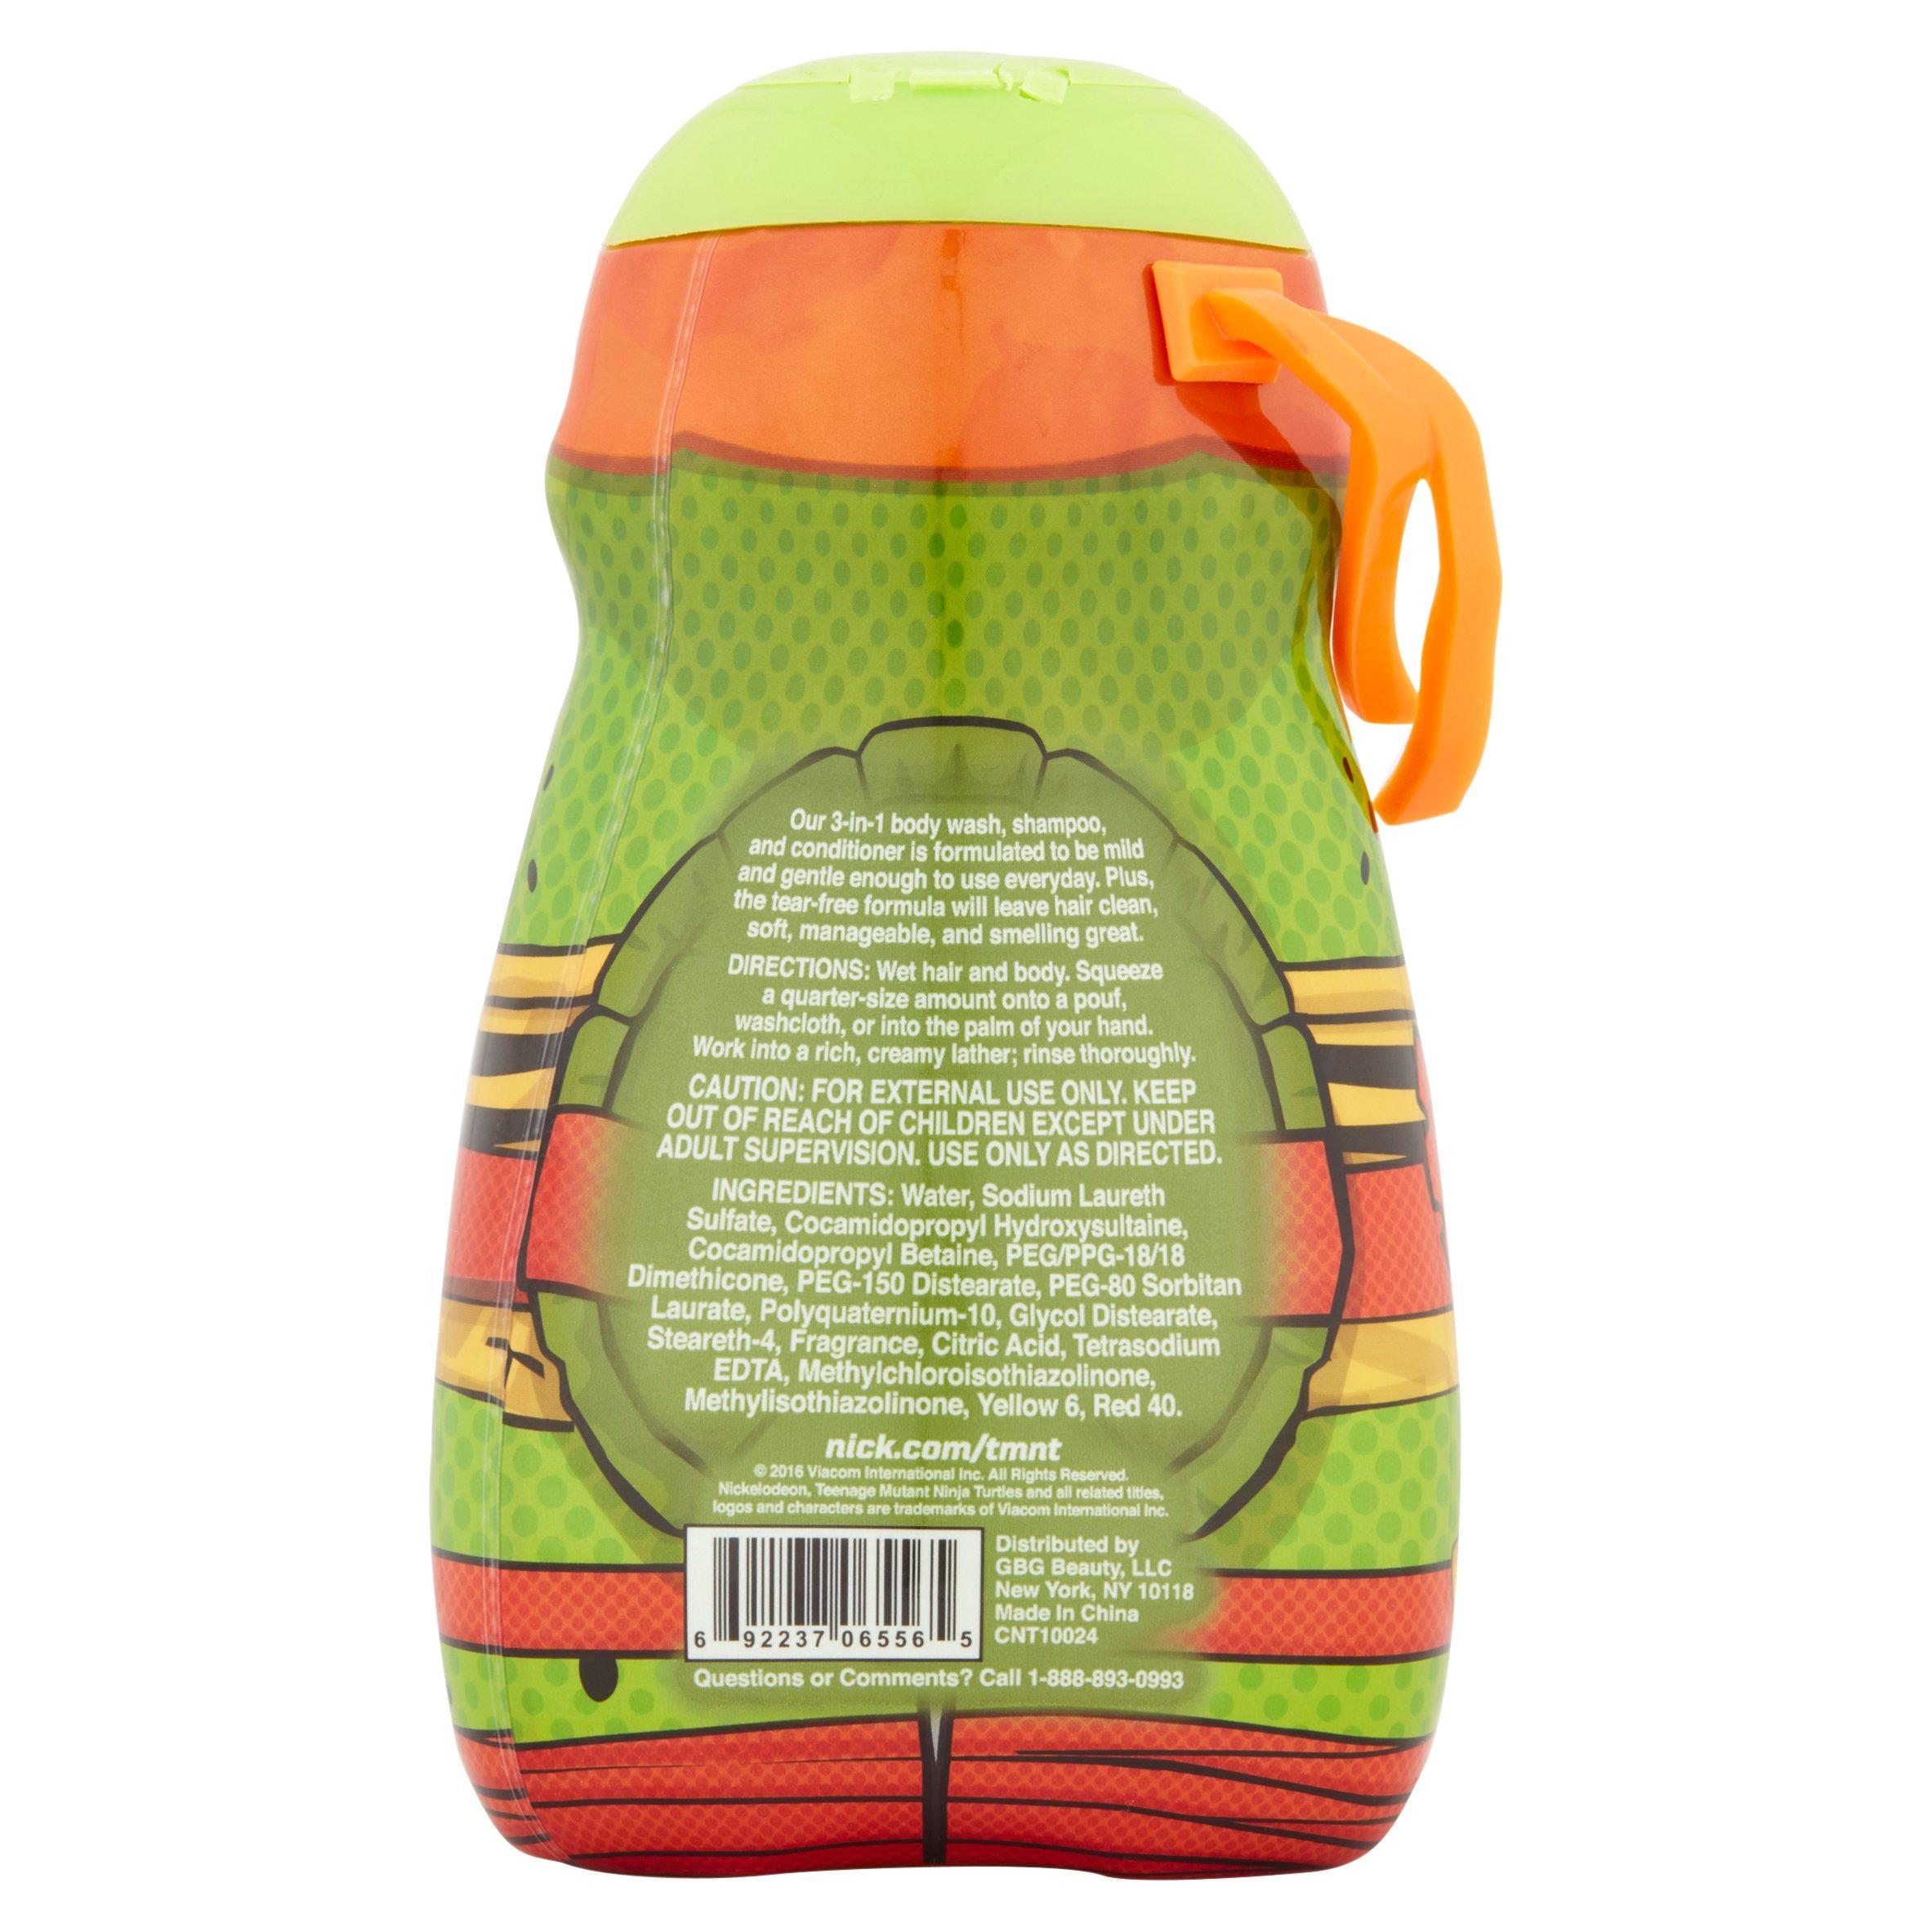 Teenage Mutant Ninja Turtles   TMNT   3 In 1 Body Wash , Shampoo,  Conditioner   Walmart.com